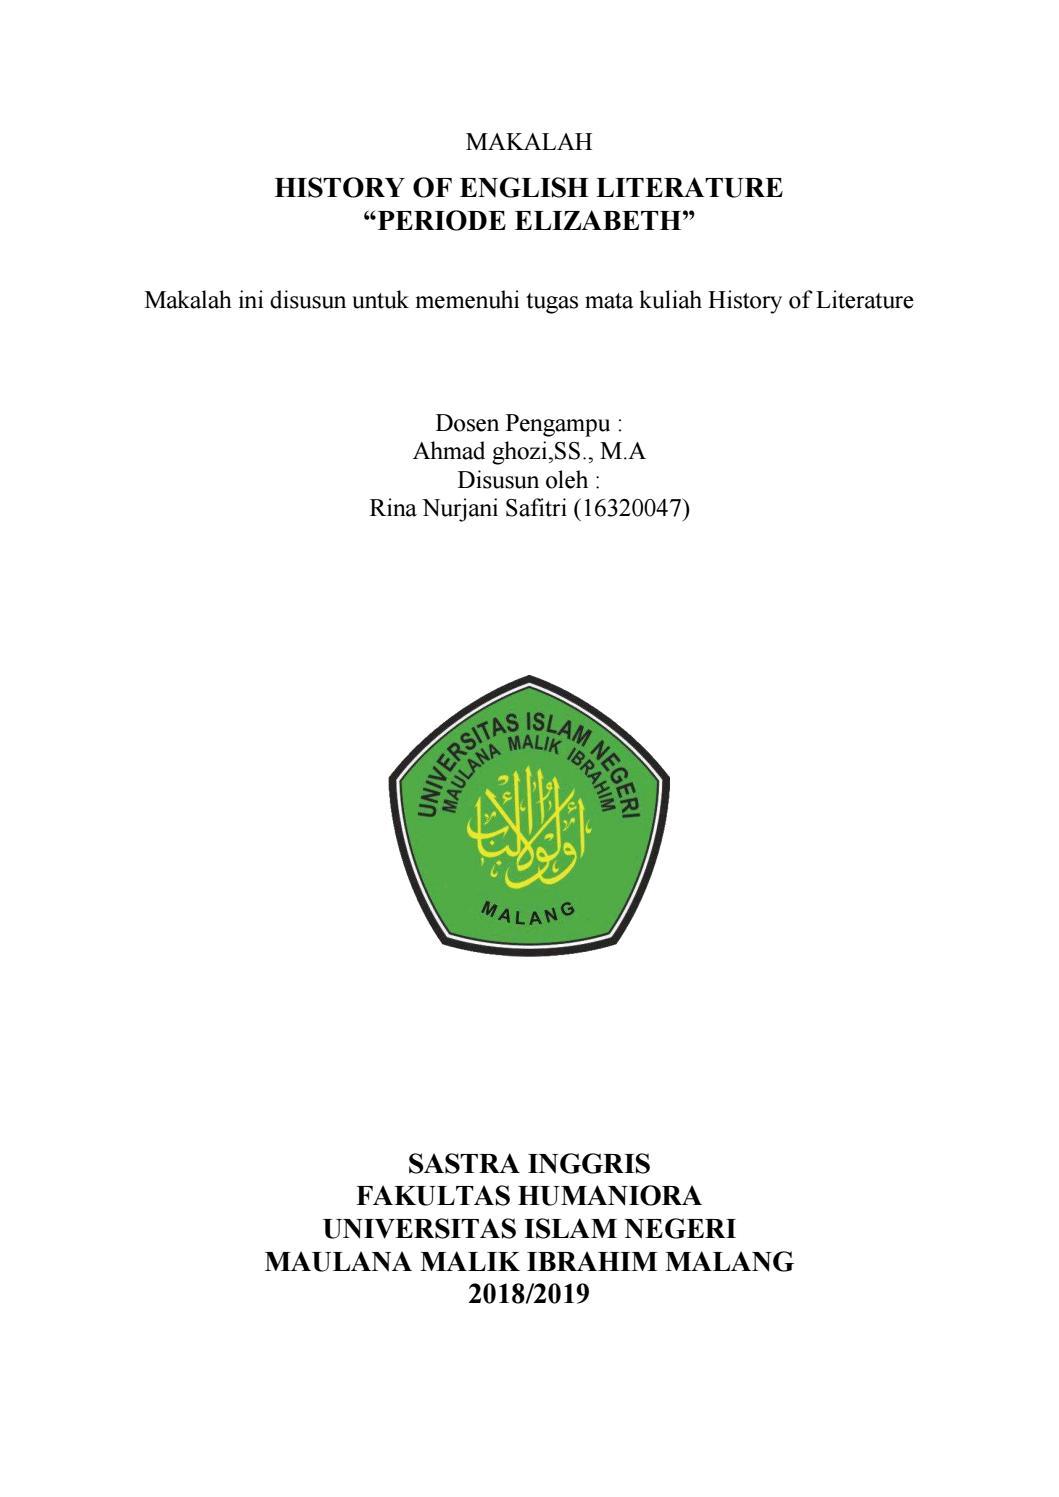 Cover Tugas Mata Kuliah Ilmusosial Id